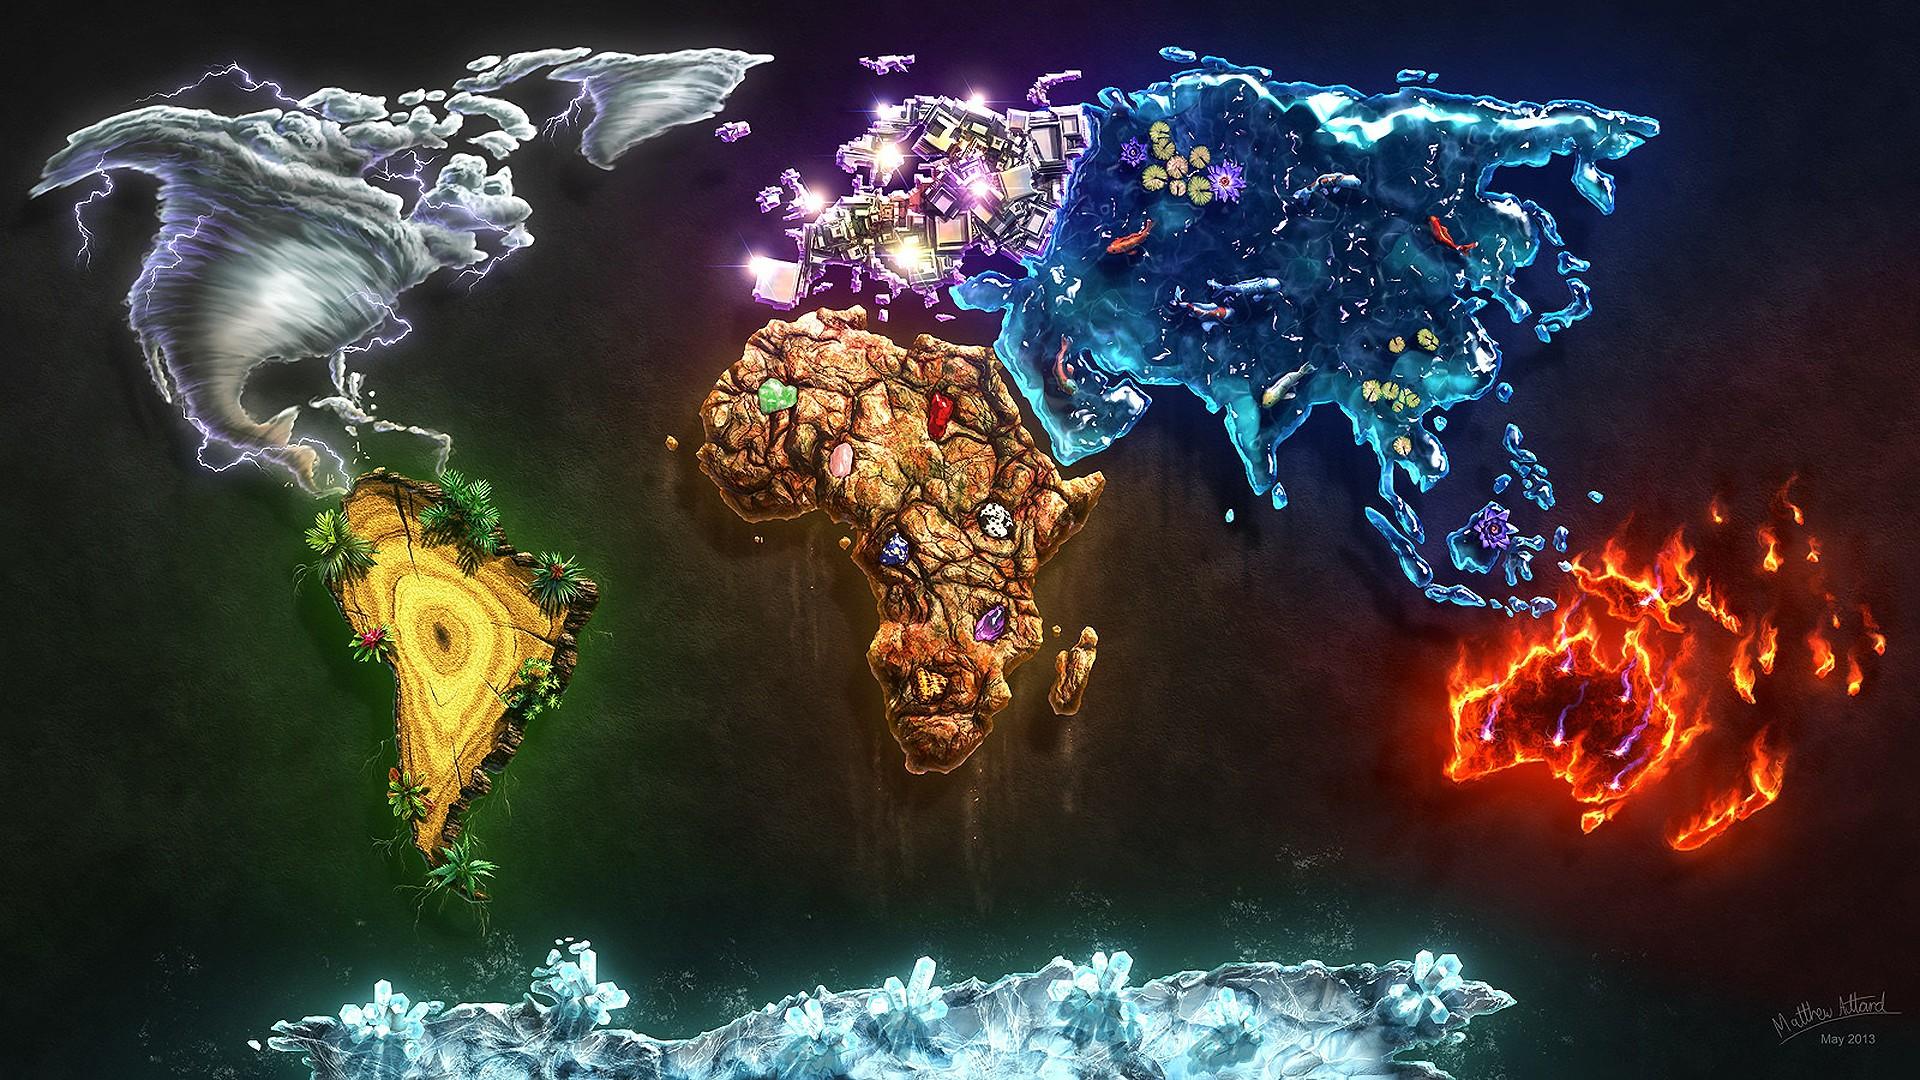 Four Elements Art : Wallpaper : 1920x1080 px air continents diamonds earth fire